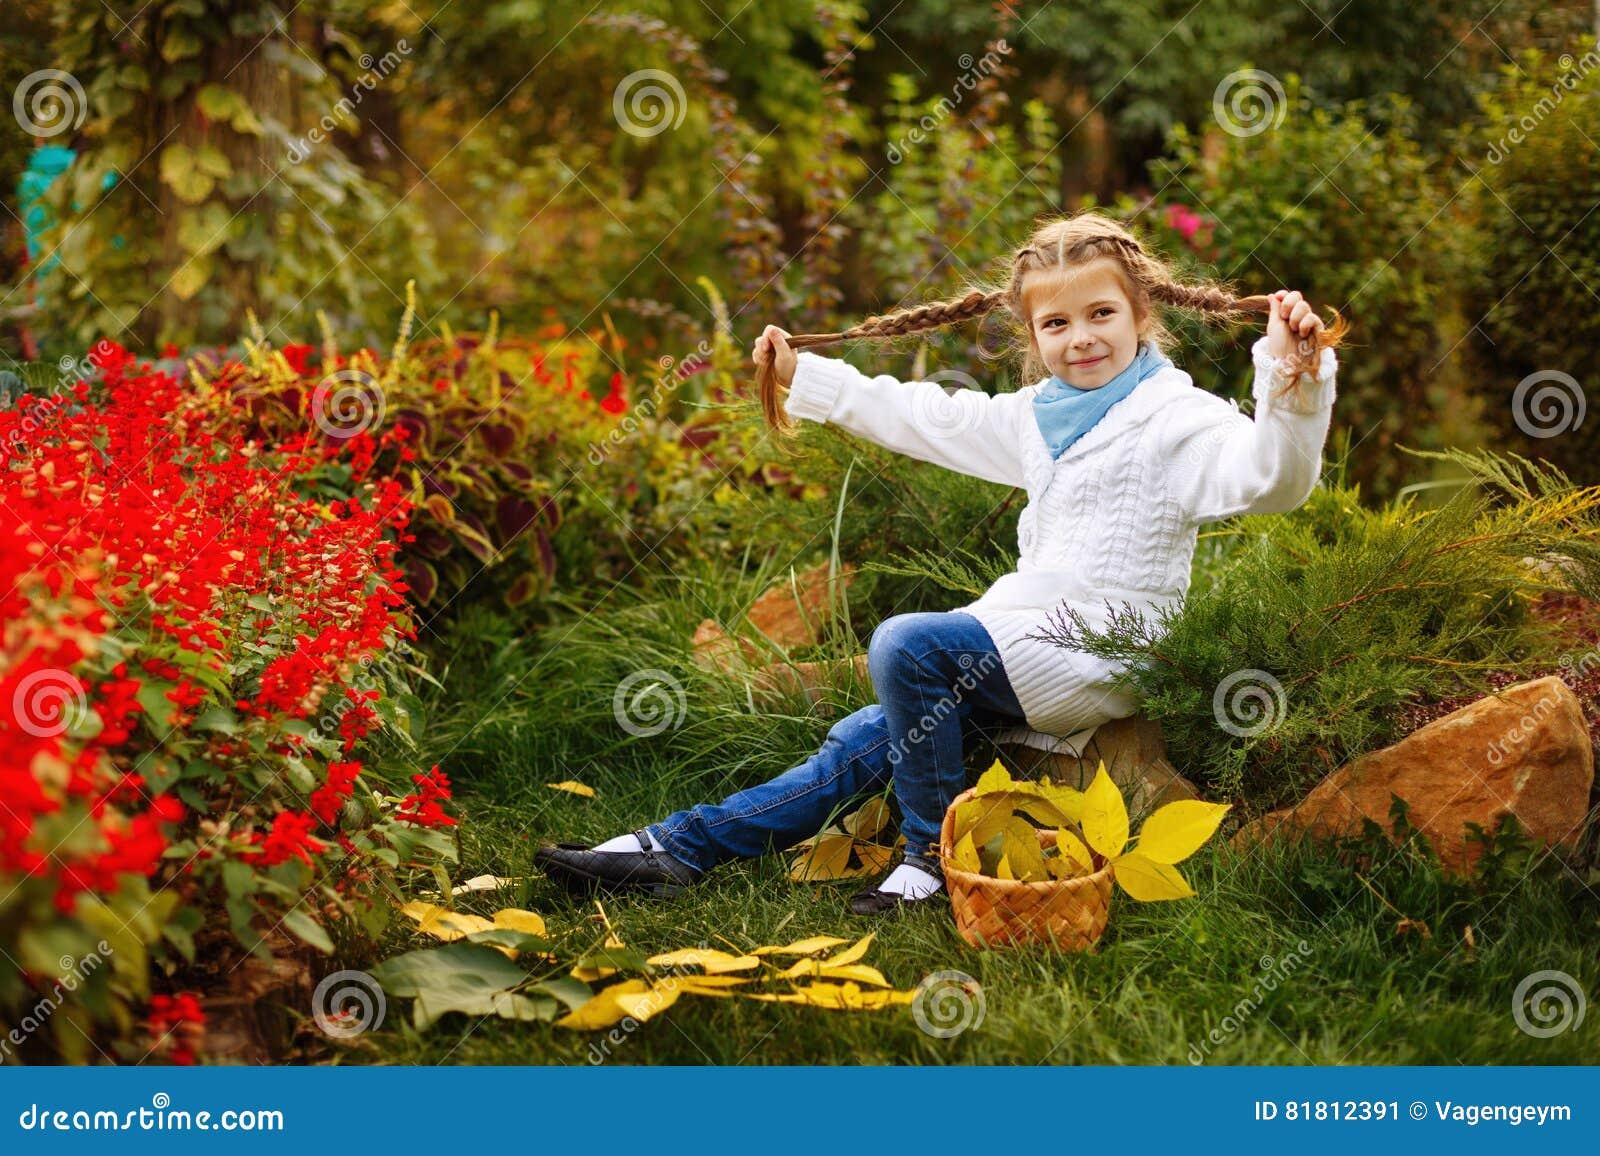 Девушка играет дурачка в парке осени